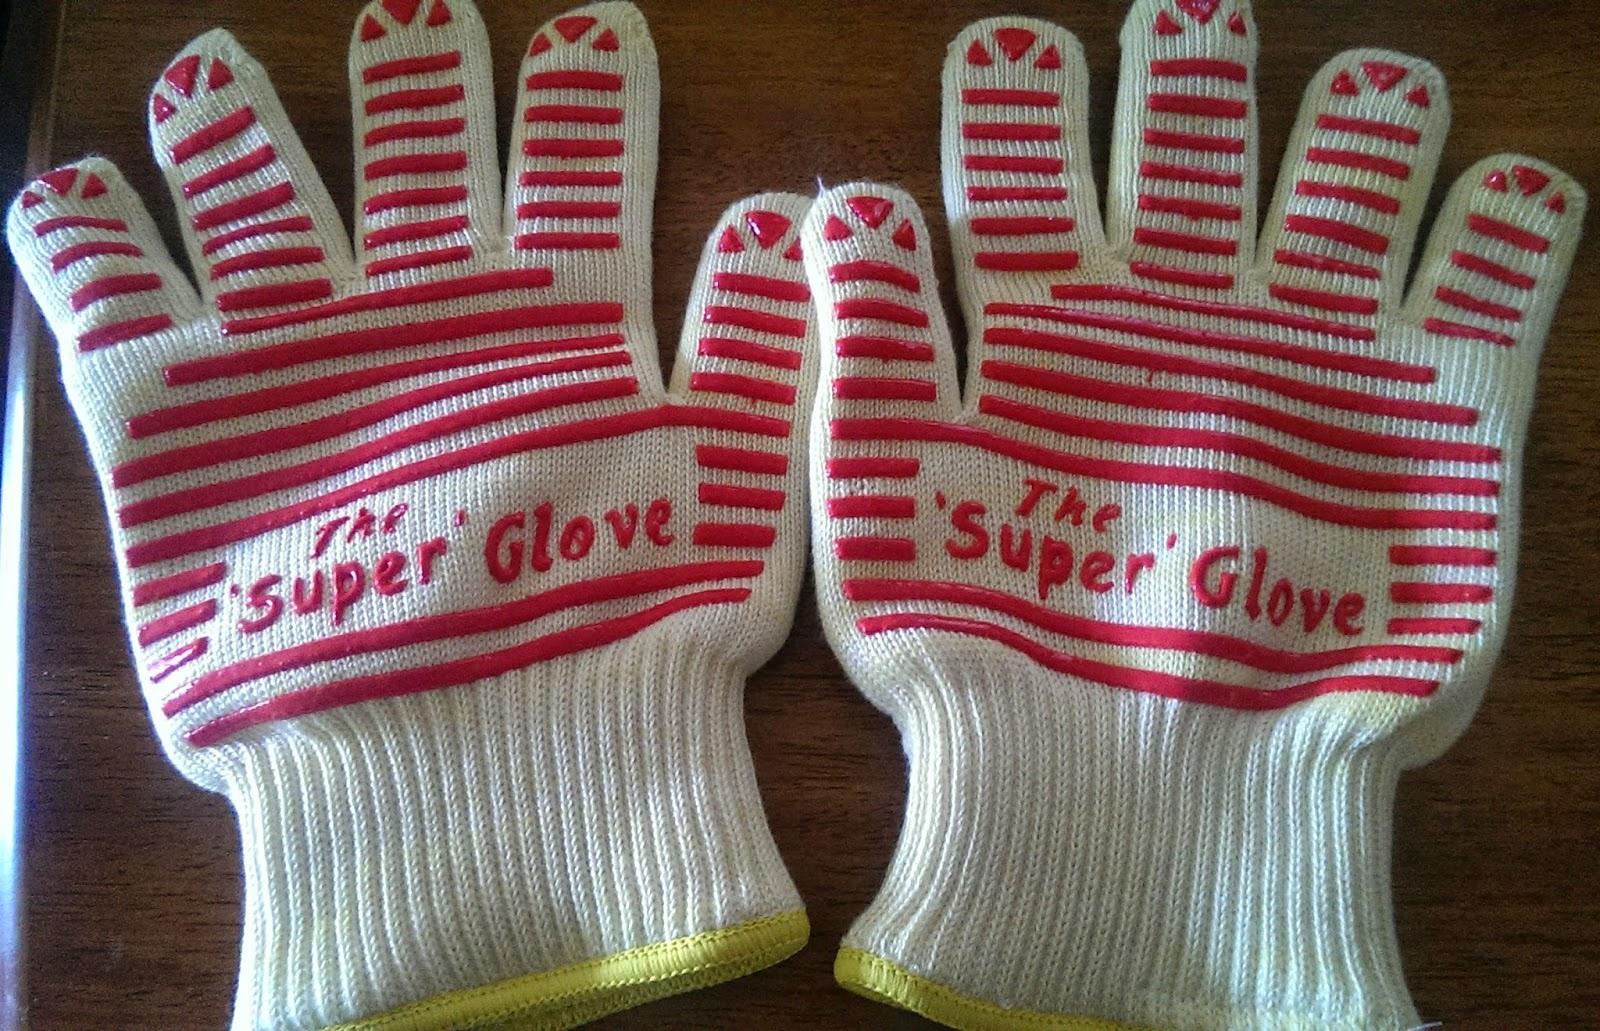 The+Super+Glove Kuisiware Heat Resistant Glove Review - Heat resistance Gloves #kuisiware